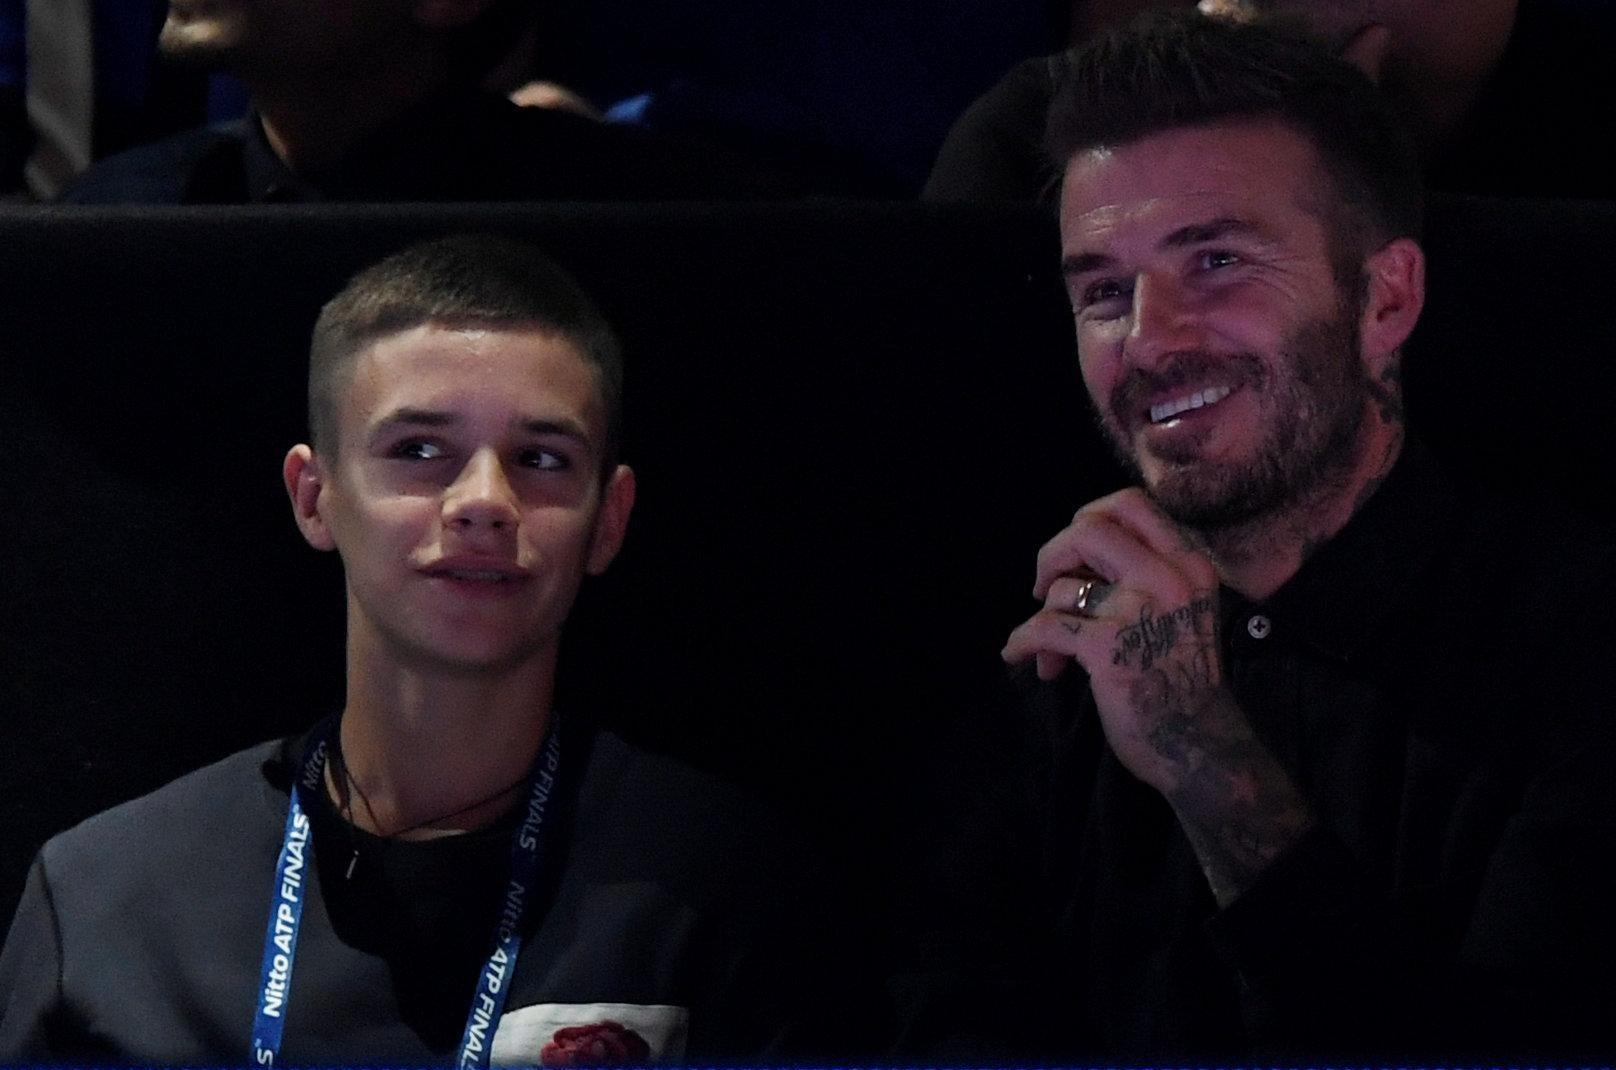 David Beckham enjoys Alexander Zverev's landmark triumph over Novak Djokovic